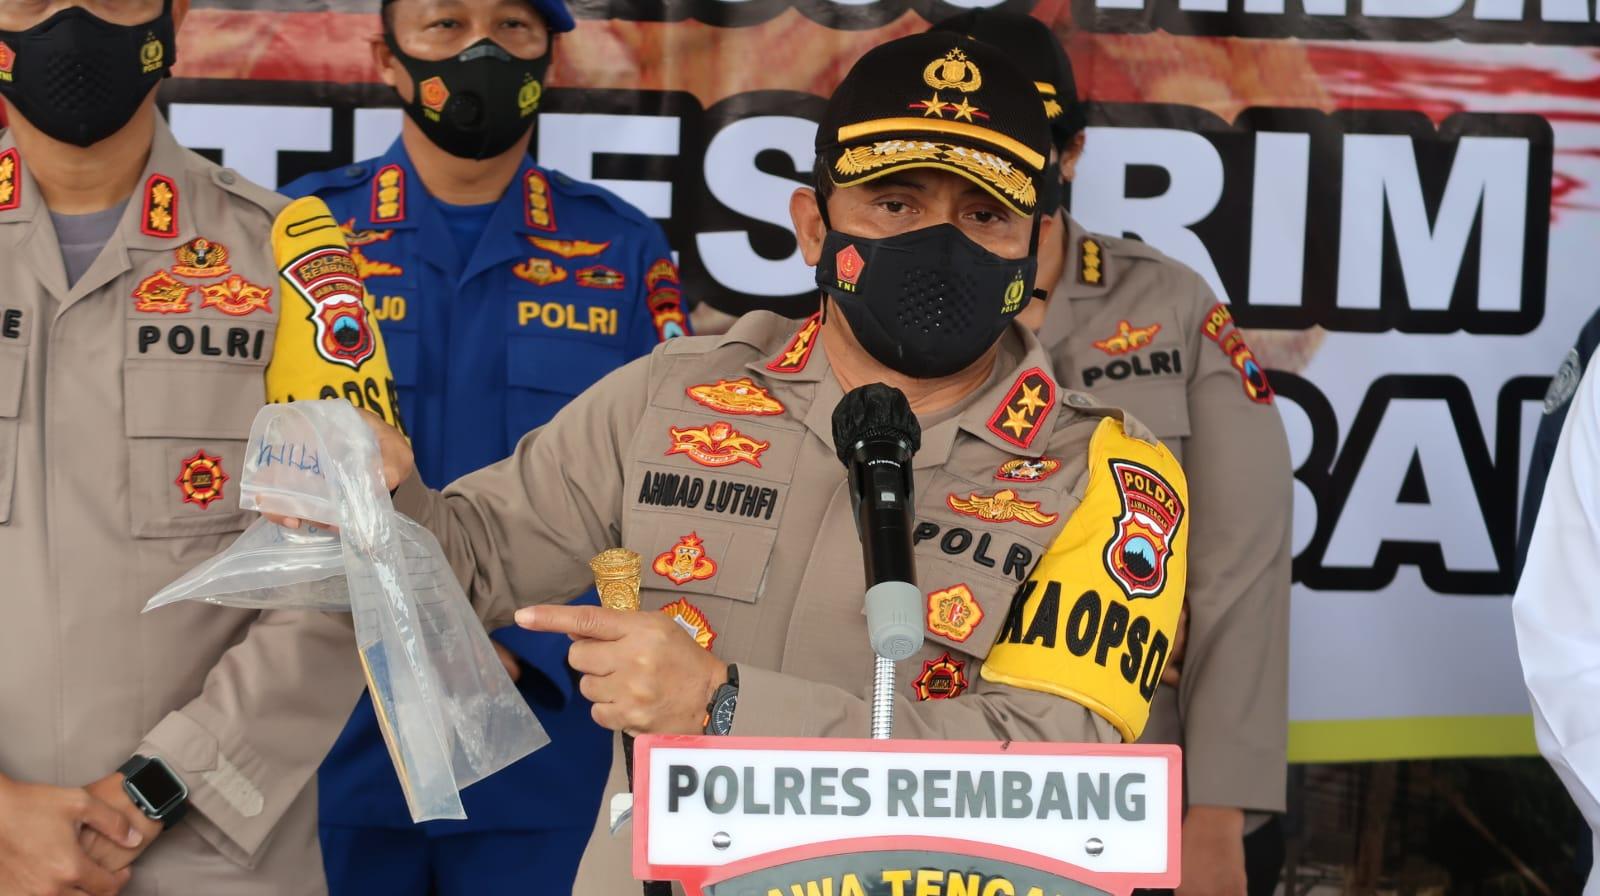 Bukti Kuat Mengarah ke Sumani, Pelaku Pembunuhan Satu Keluarga di Rembang